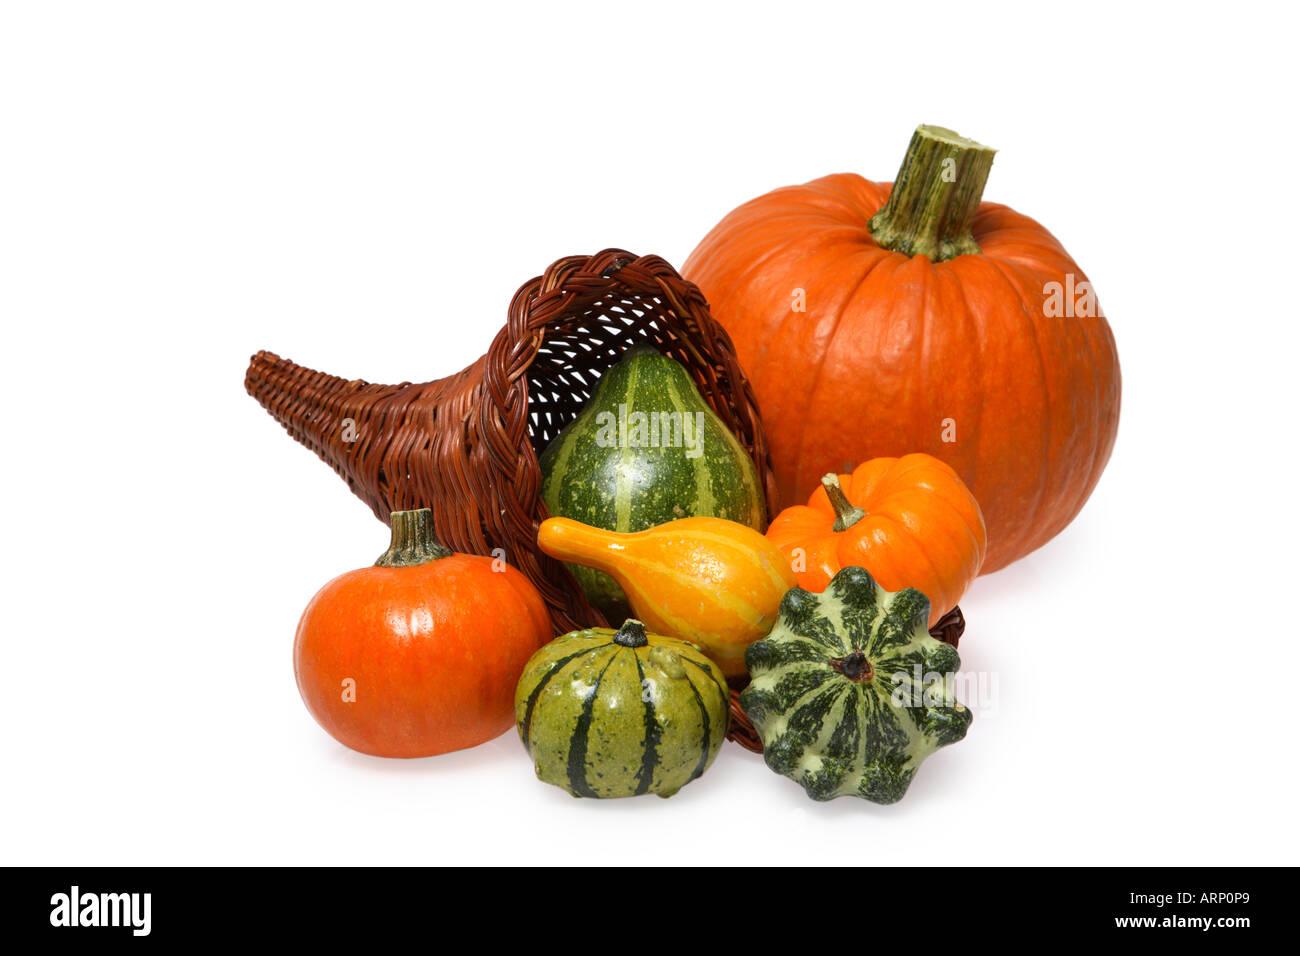 Cornucopia, Gourds and Pumpkin - Stock Image